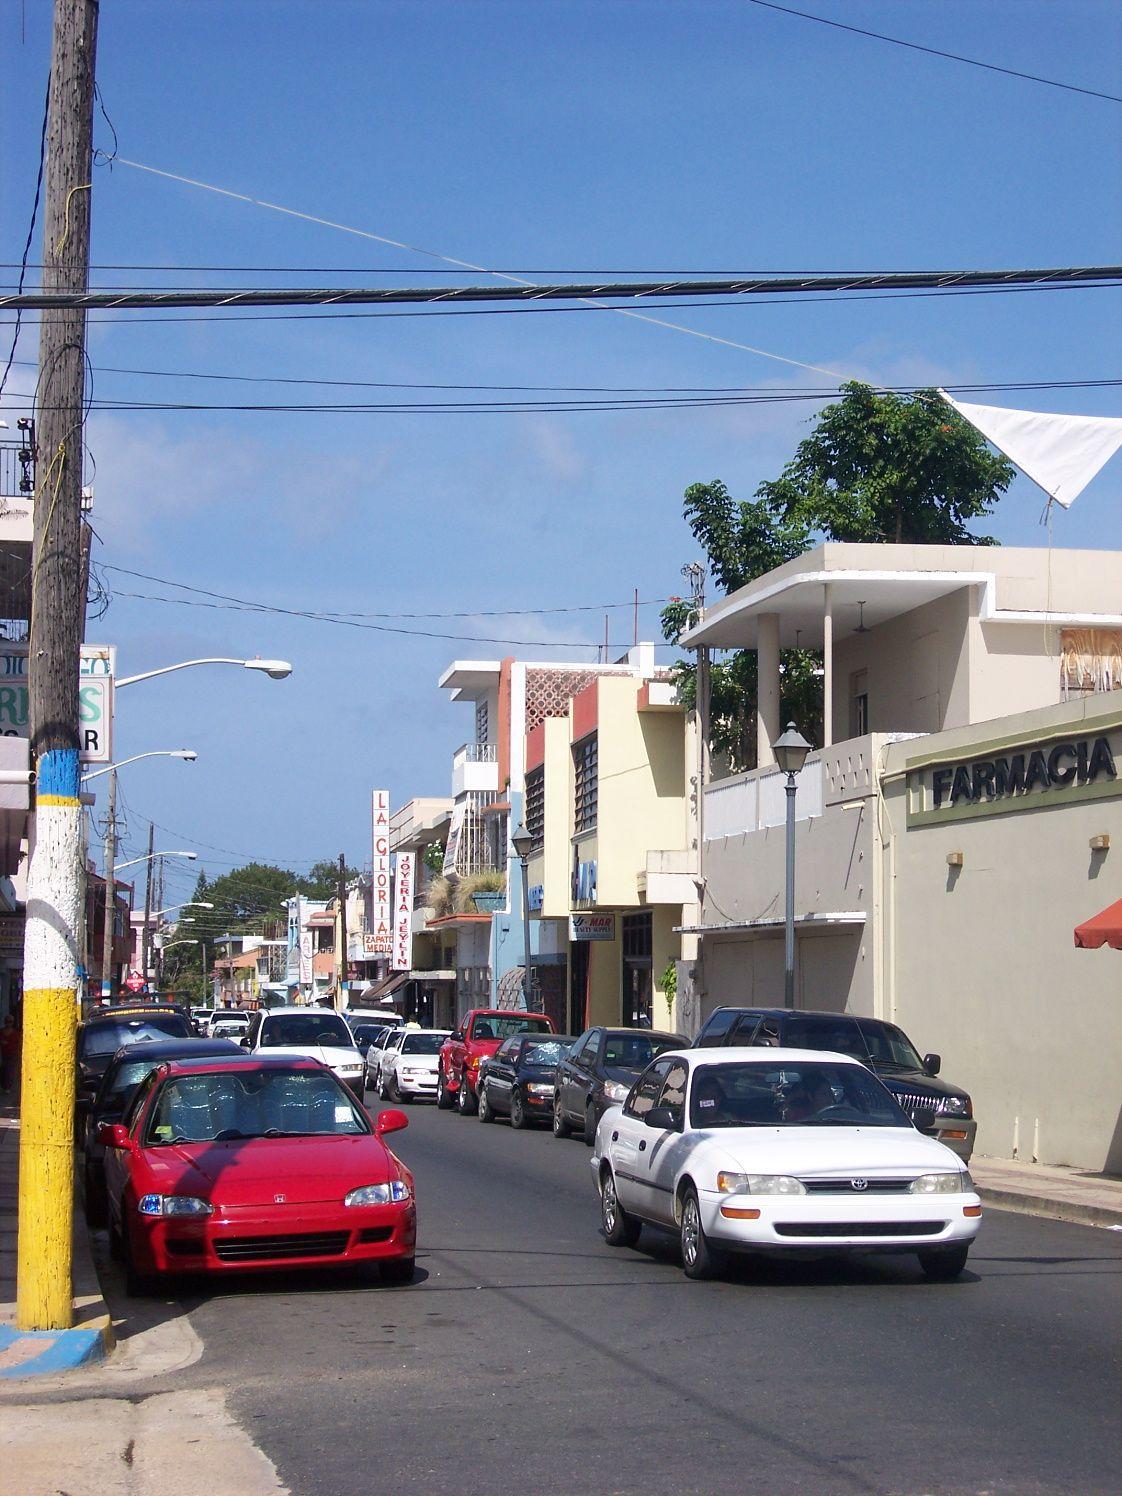 Aguada, Puerto Rico I walked this same exact street thats